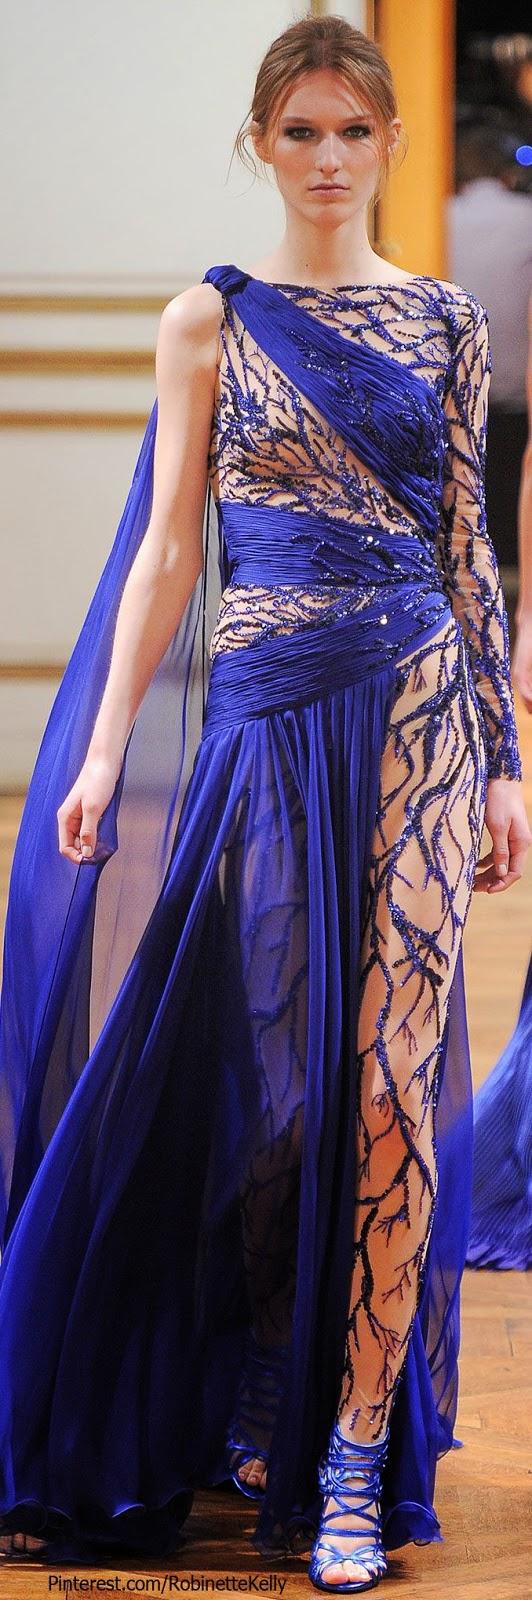 amazing dark blue Zuhair Murad gown, F/W 2013